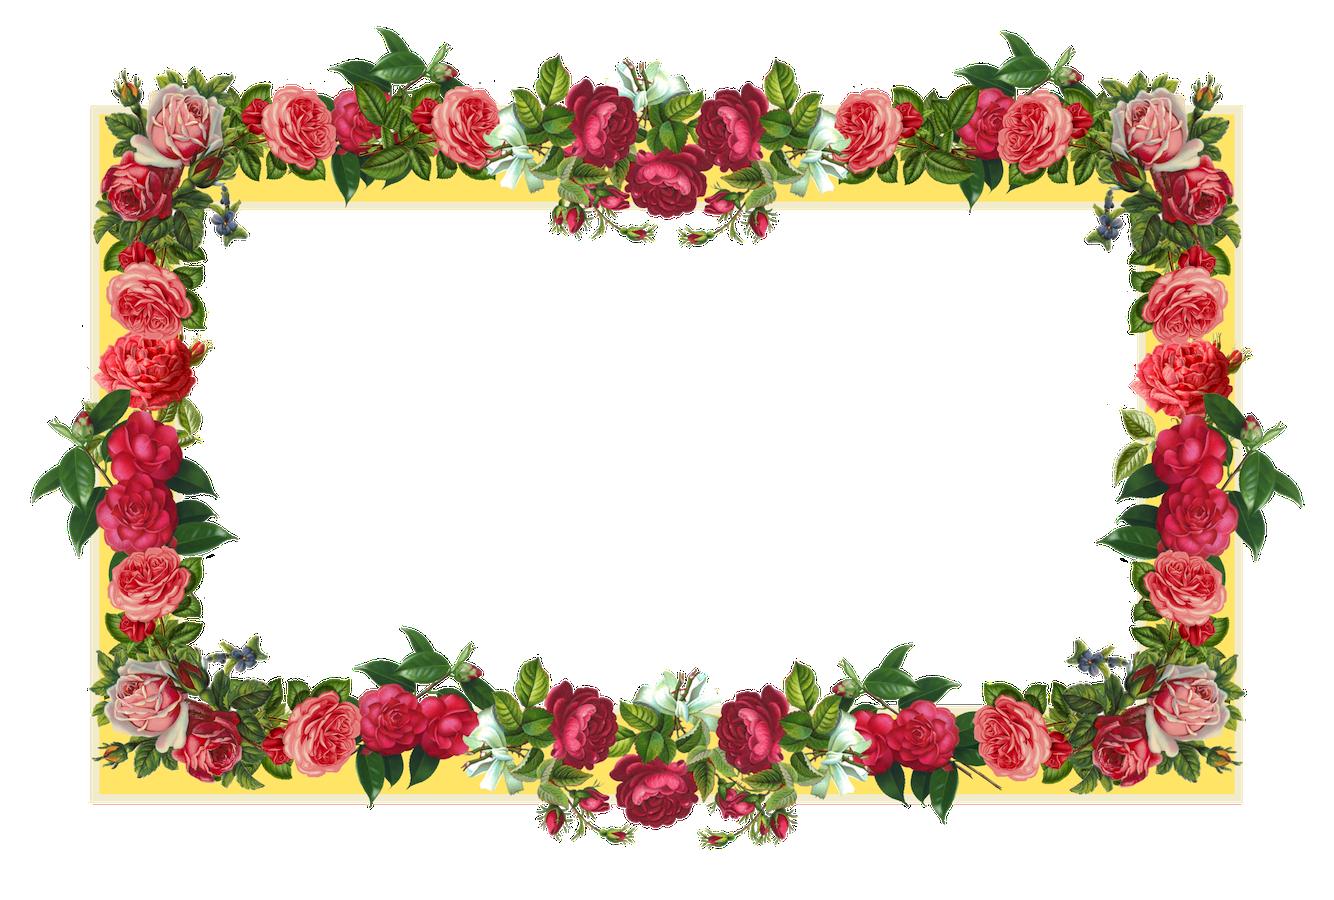 Flowers Borders PNG - 15468